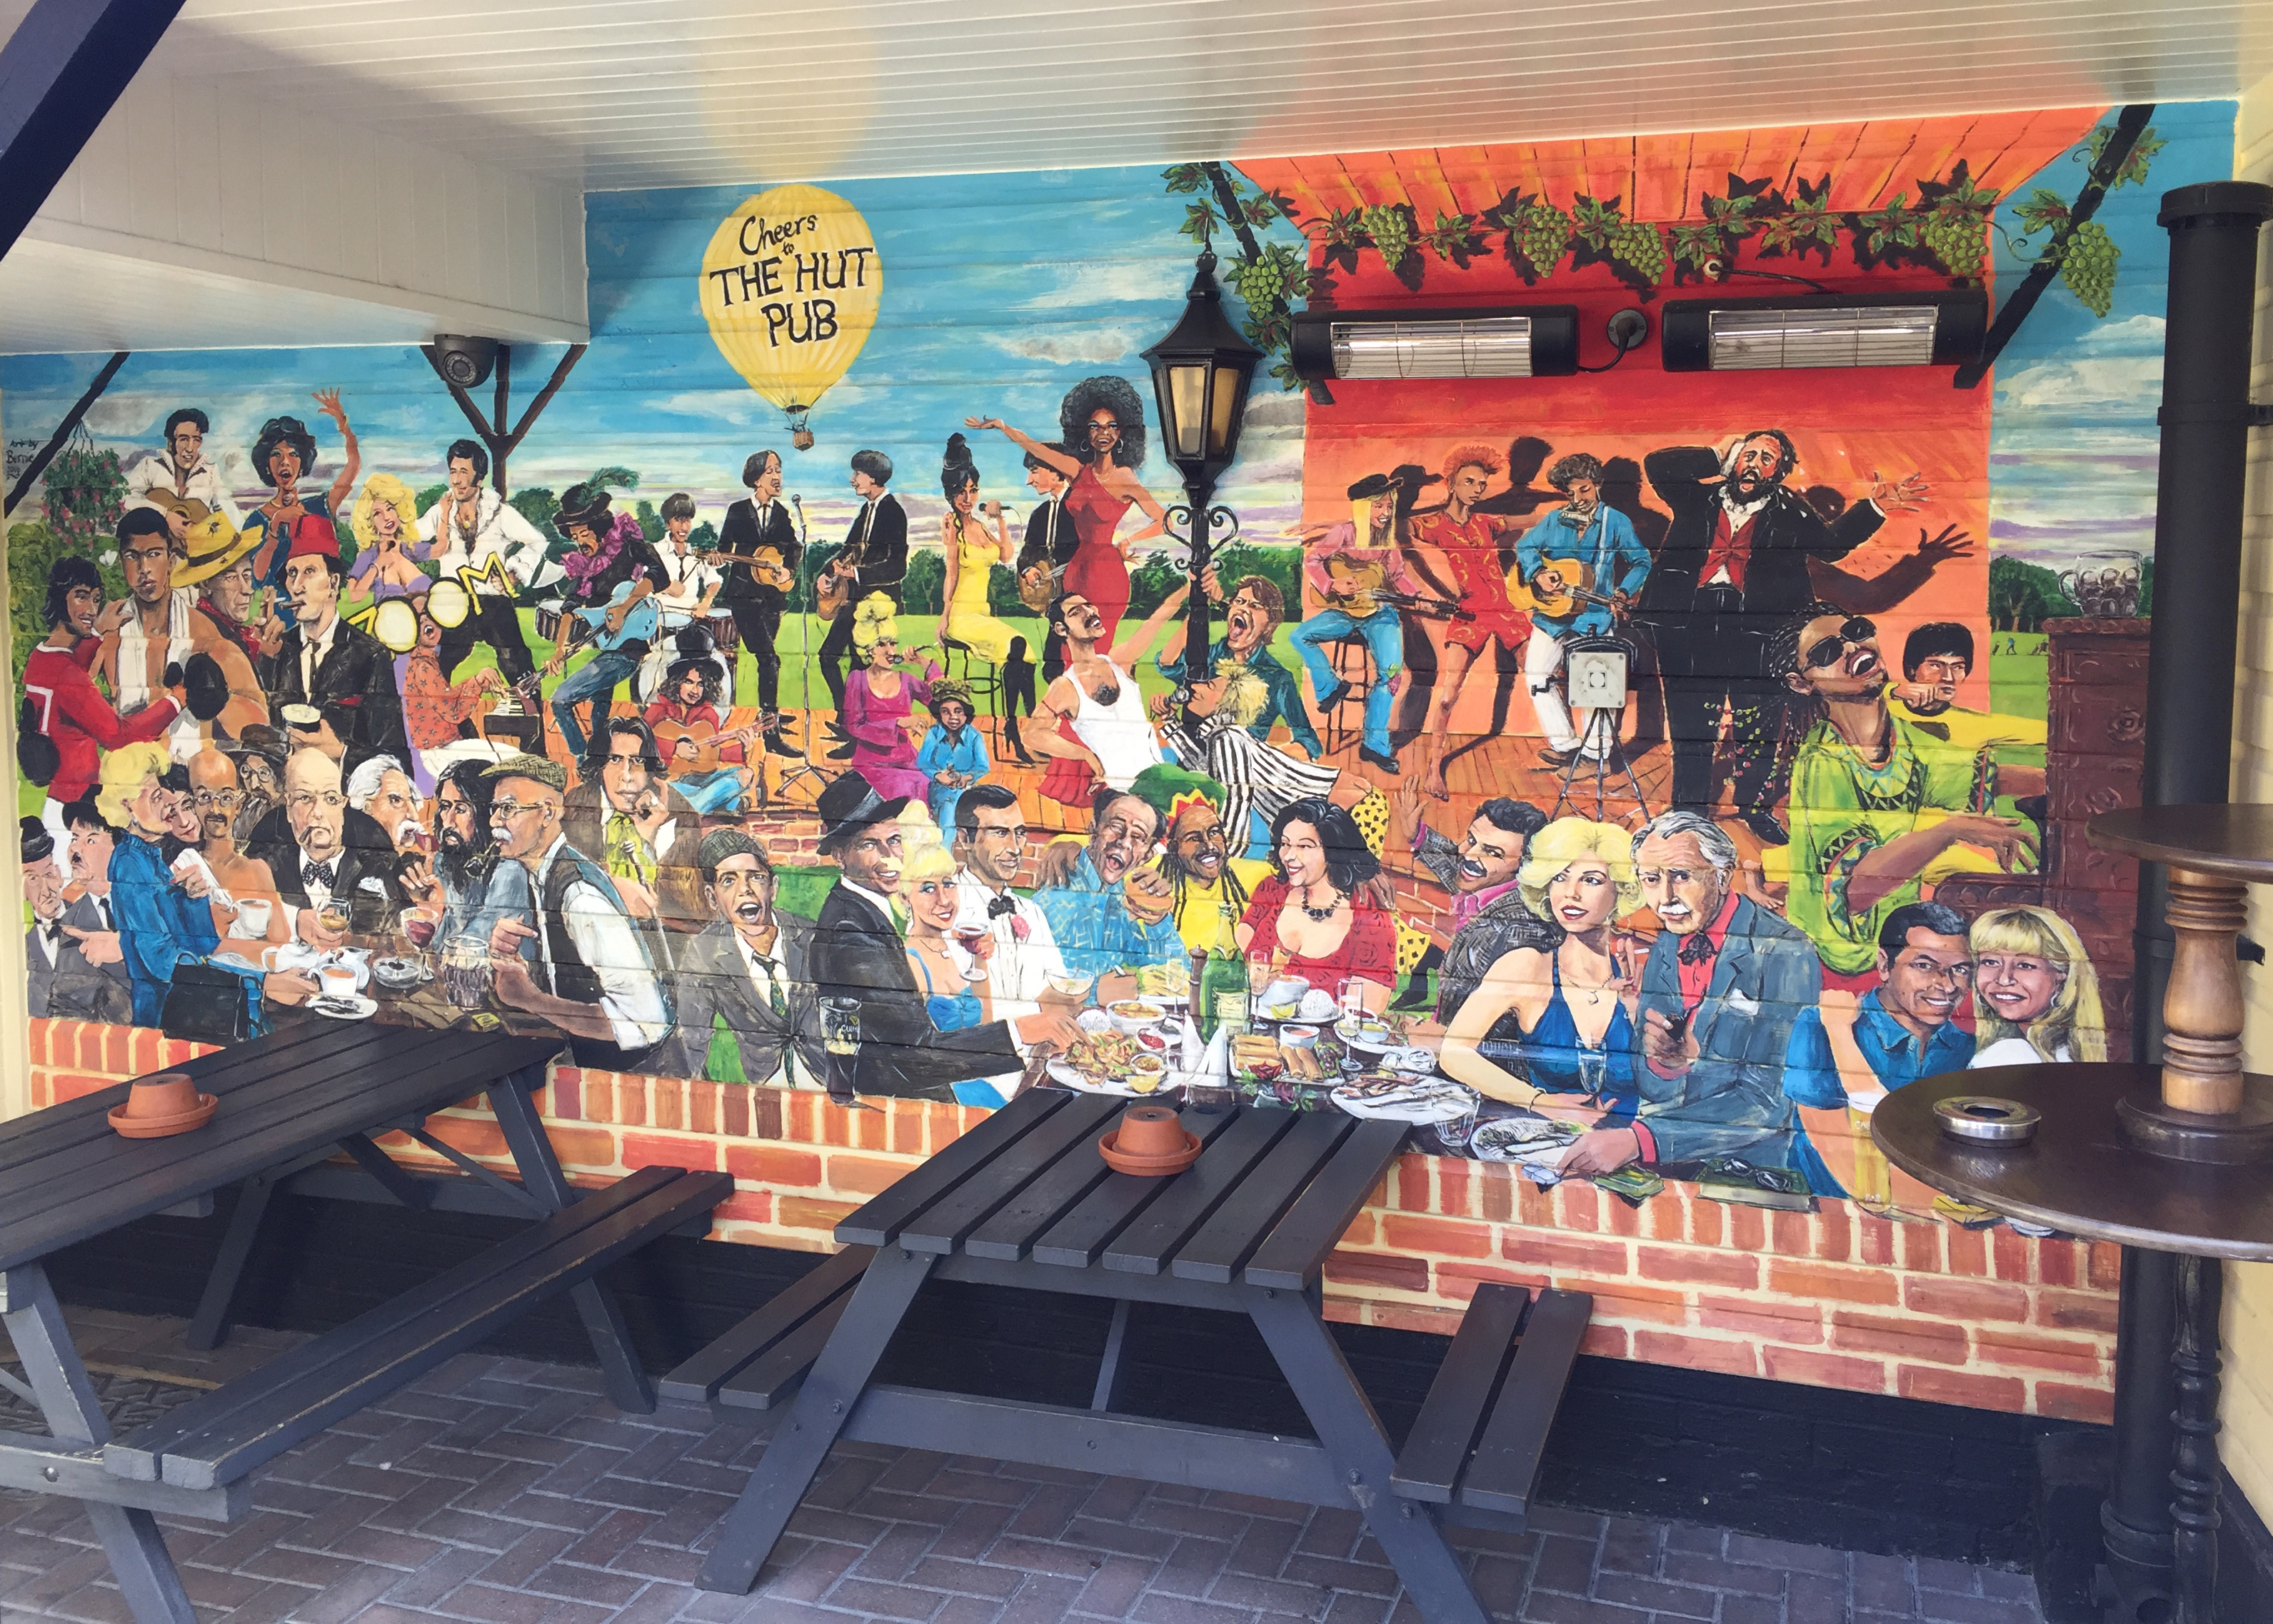 The Hut Pub - Outside Mural